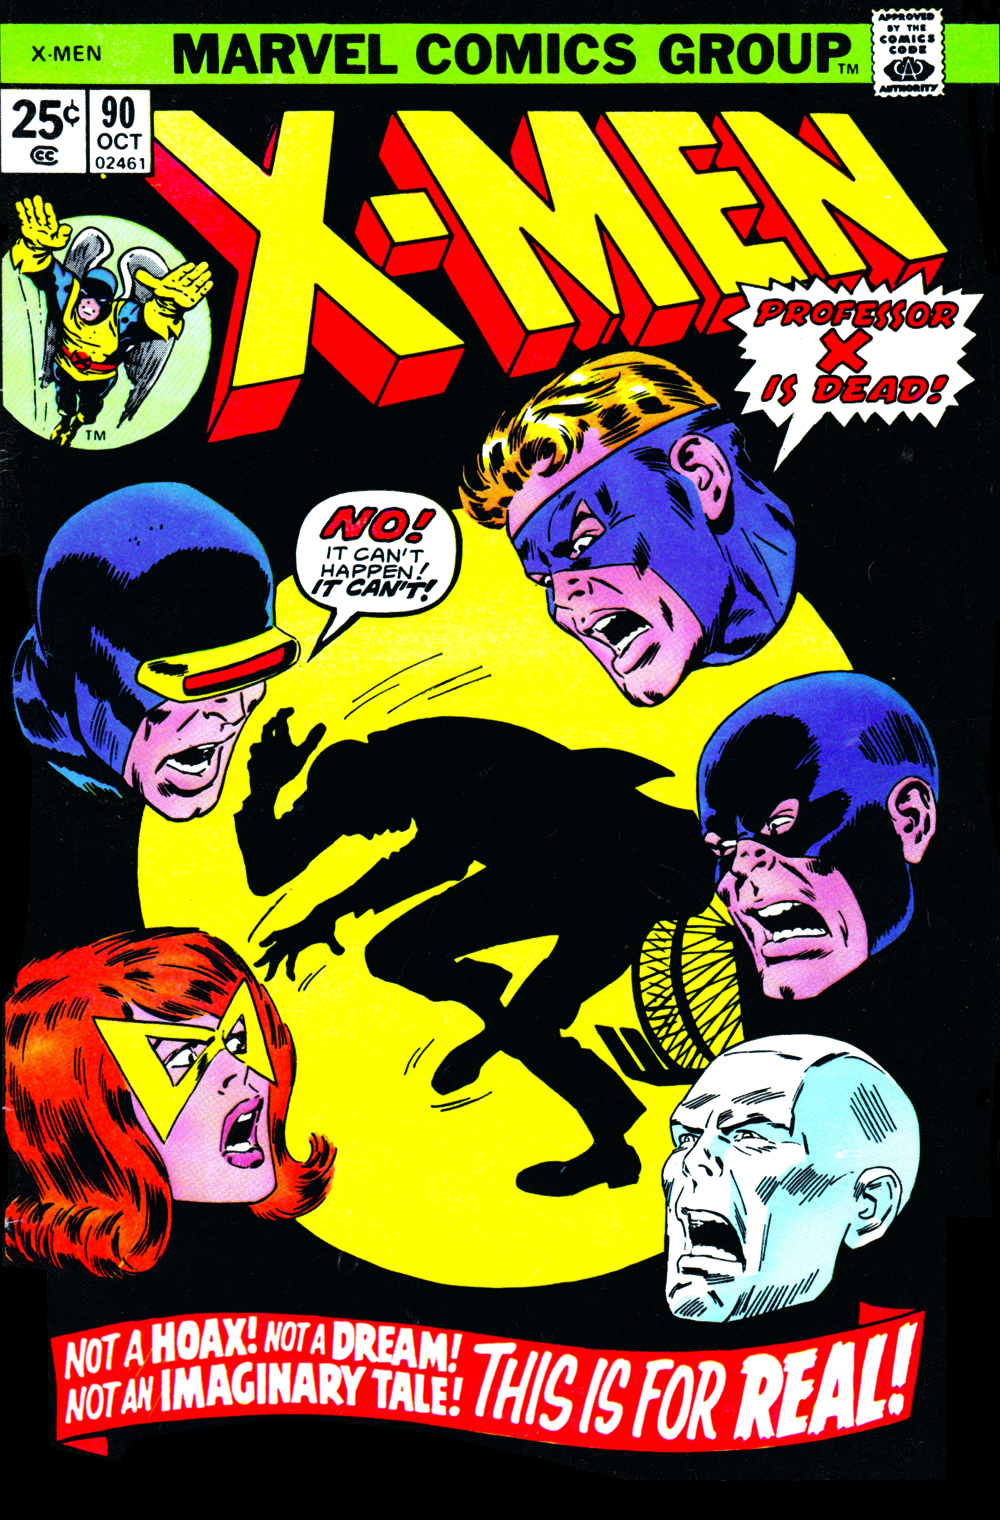 Uncanny X-Men (1963) #90